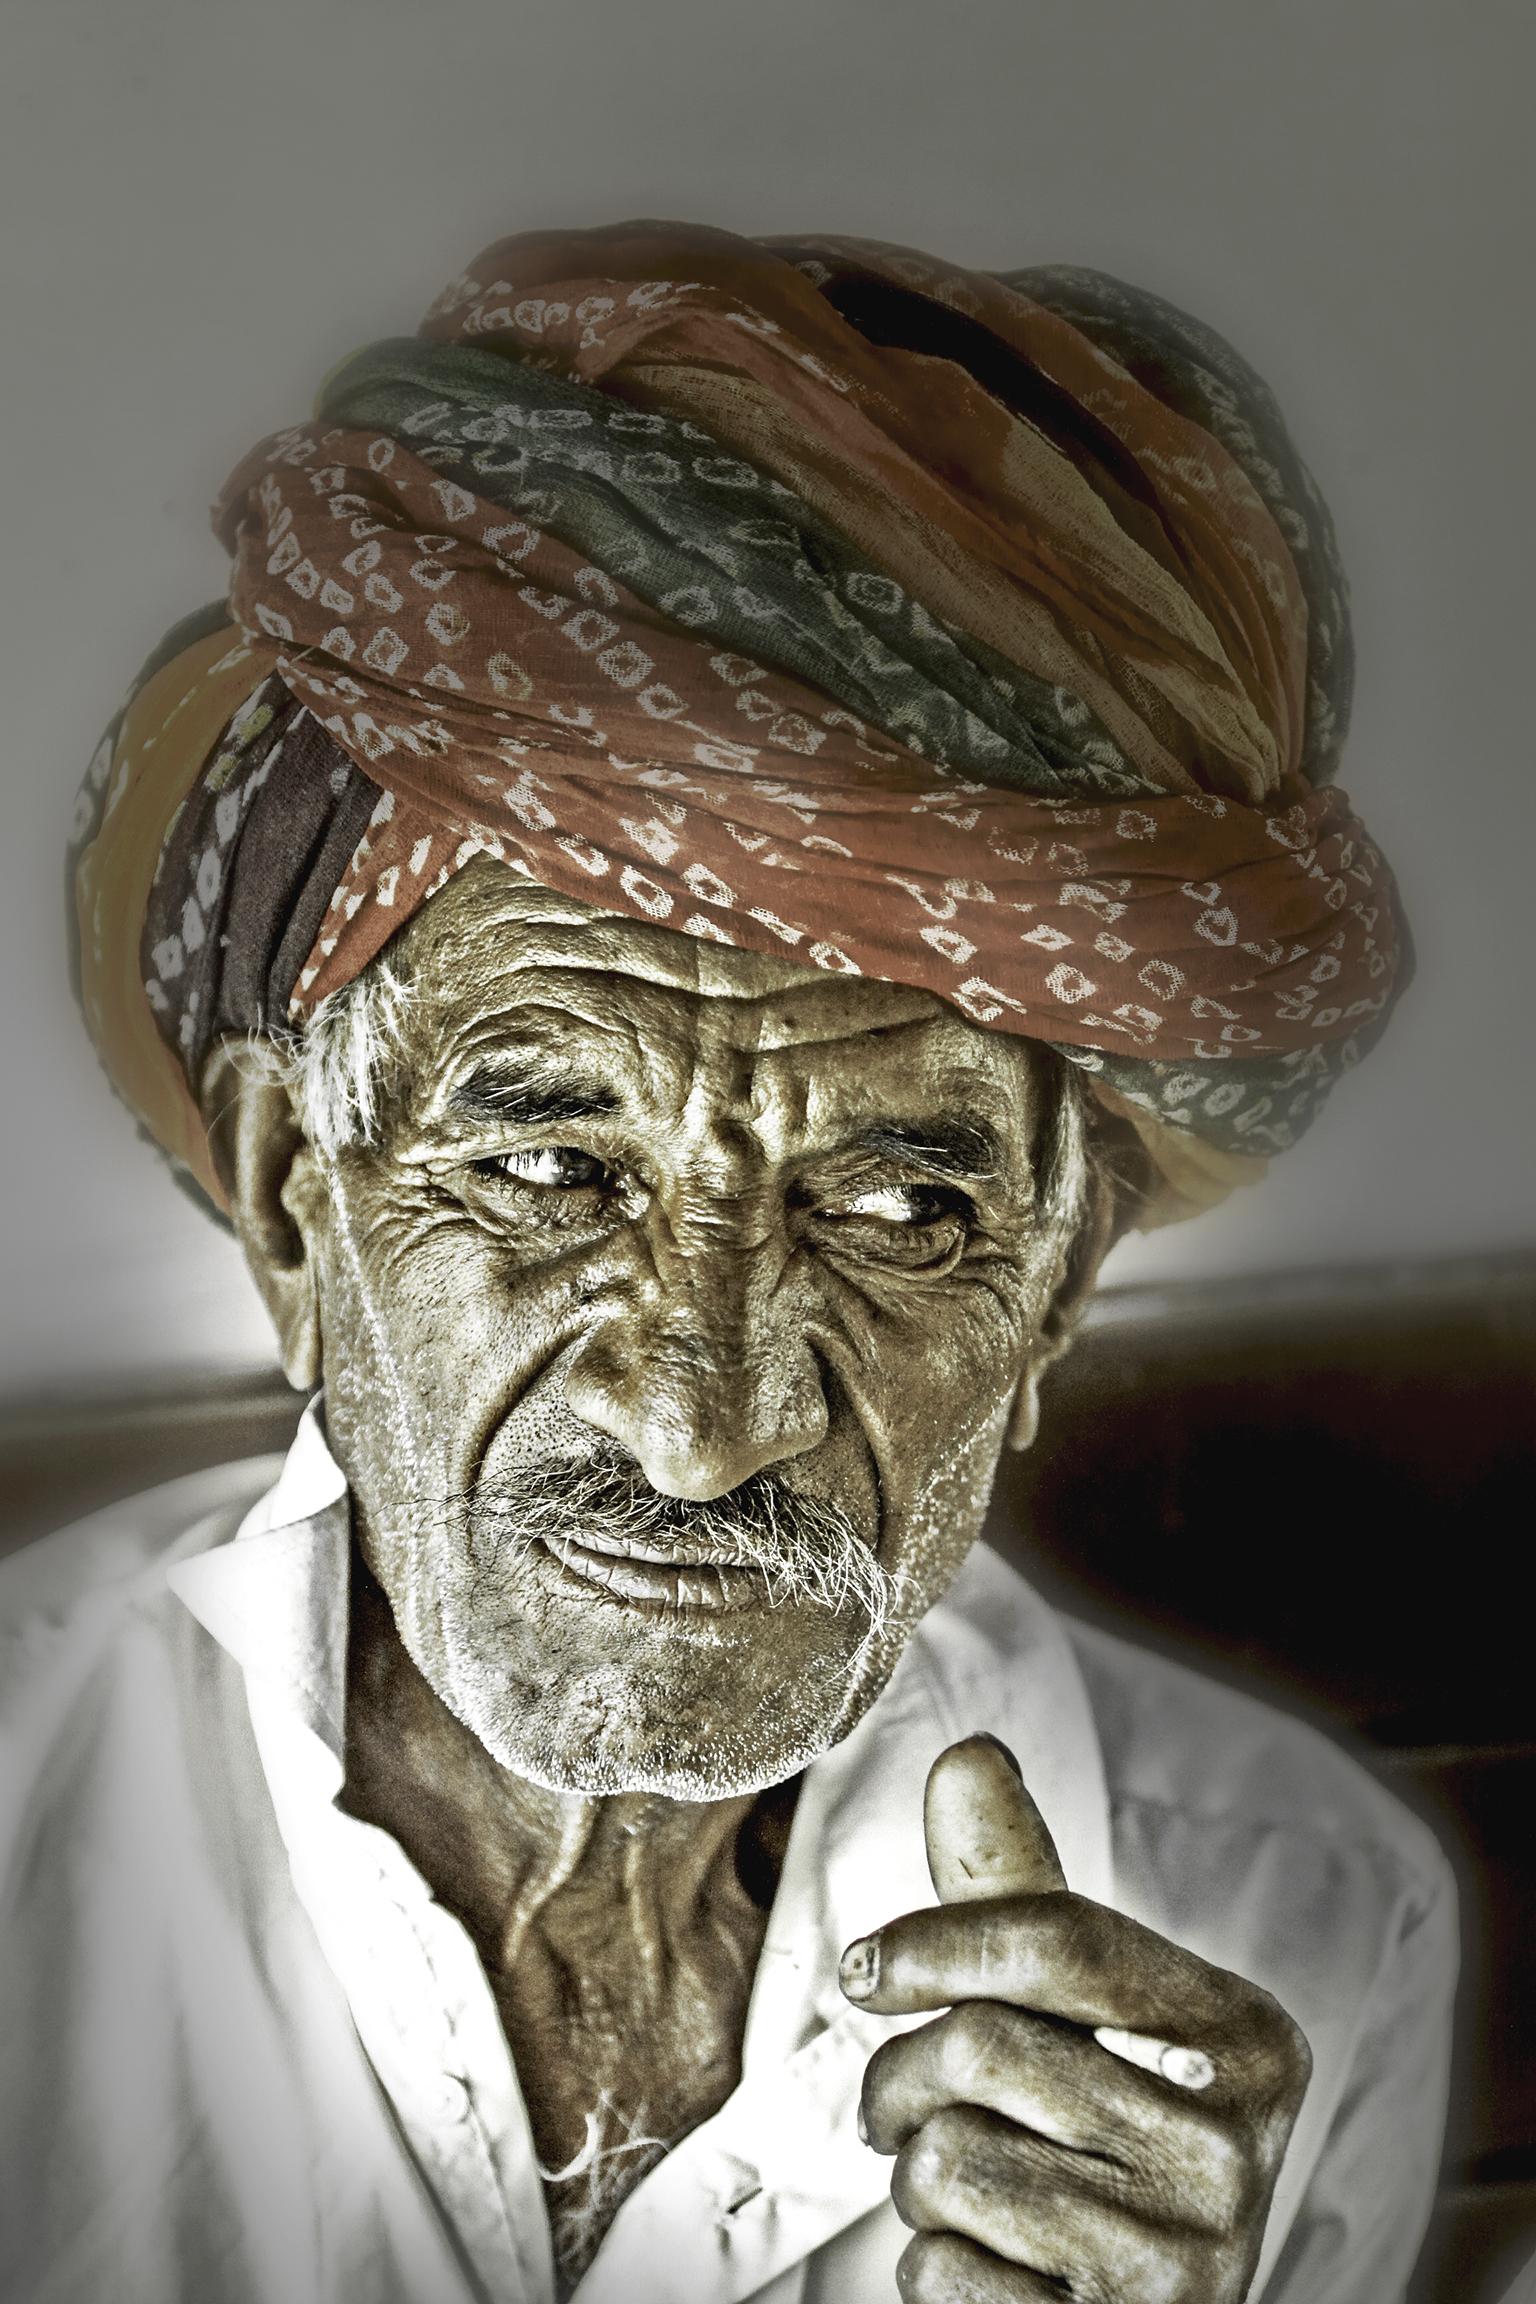 portraits-indien-inde-rajasthan-2010-marie-colette-becker-05